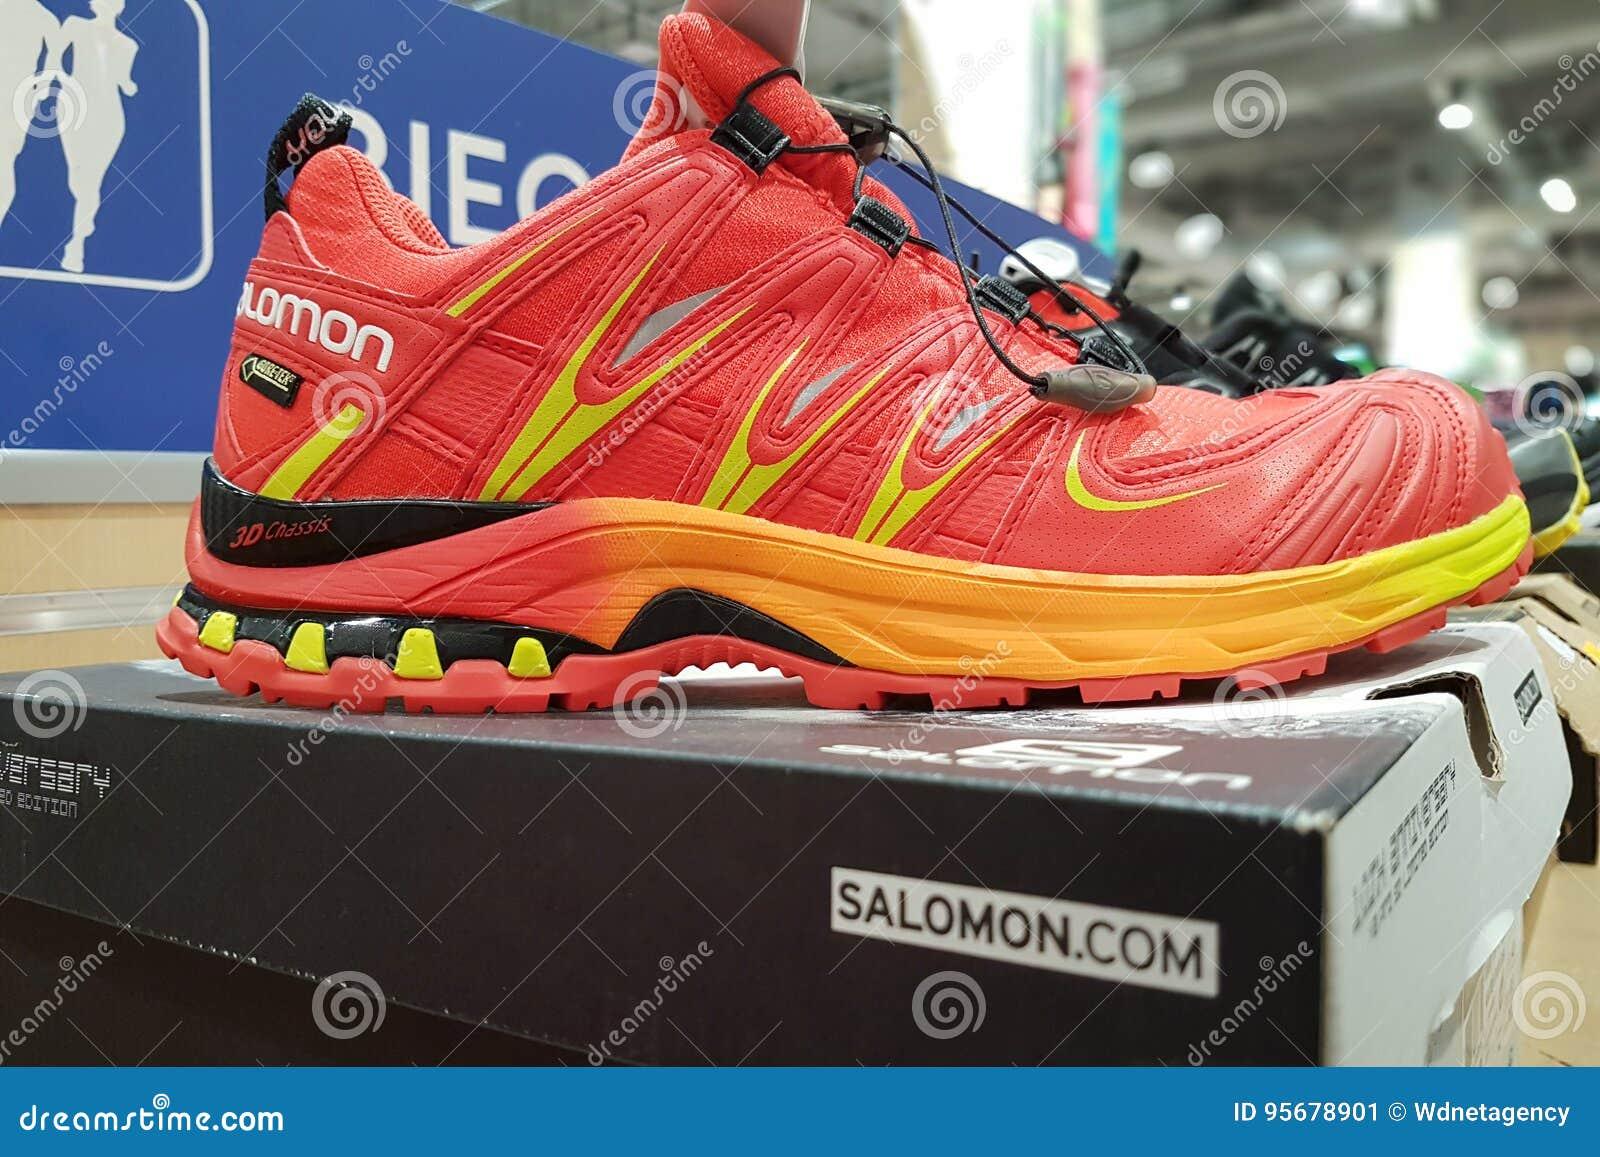 7bc9a5dfe7b Shoes 95678901 Editorial Sports Photo Of Image Salomon Z5aTxqwx